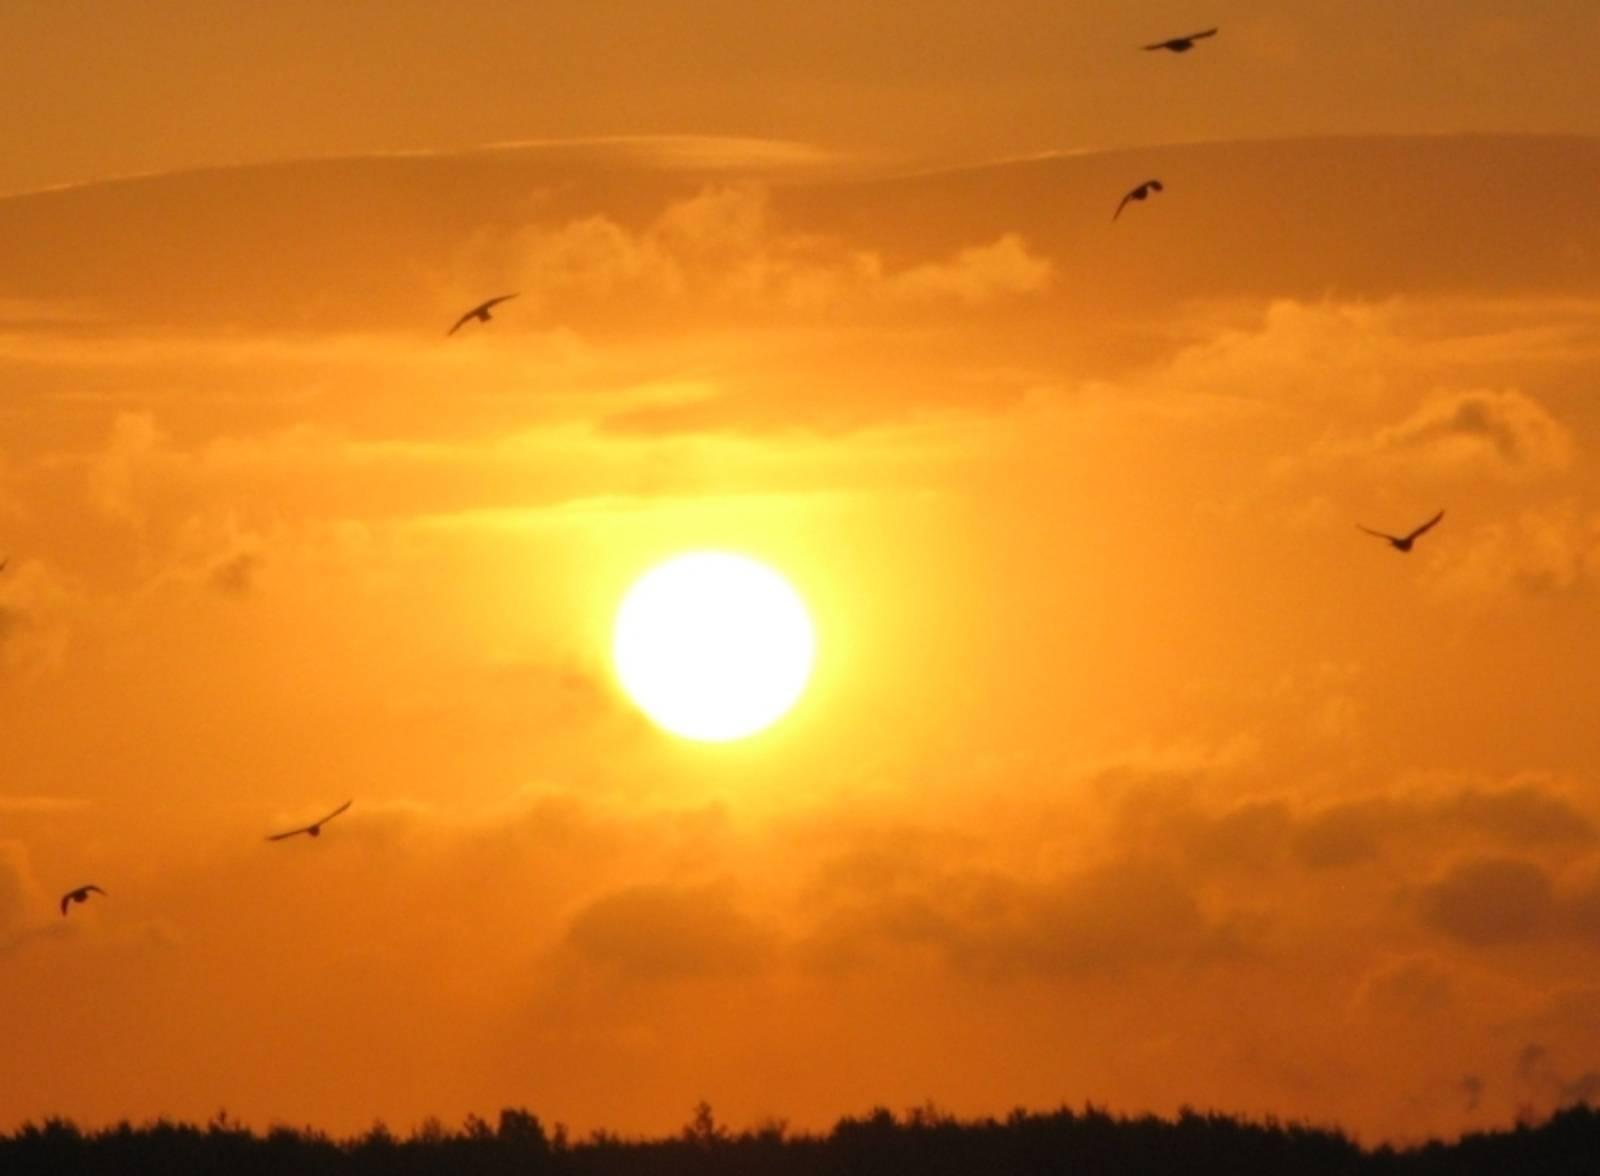 Sonnenuntergang mit Vögeln